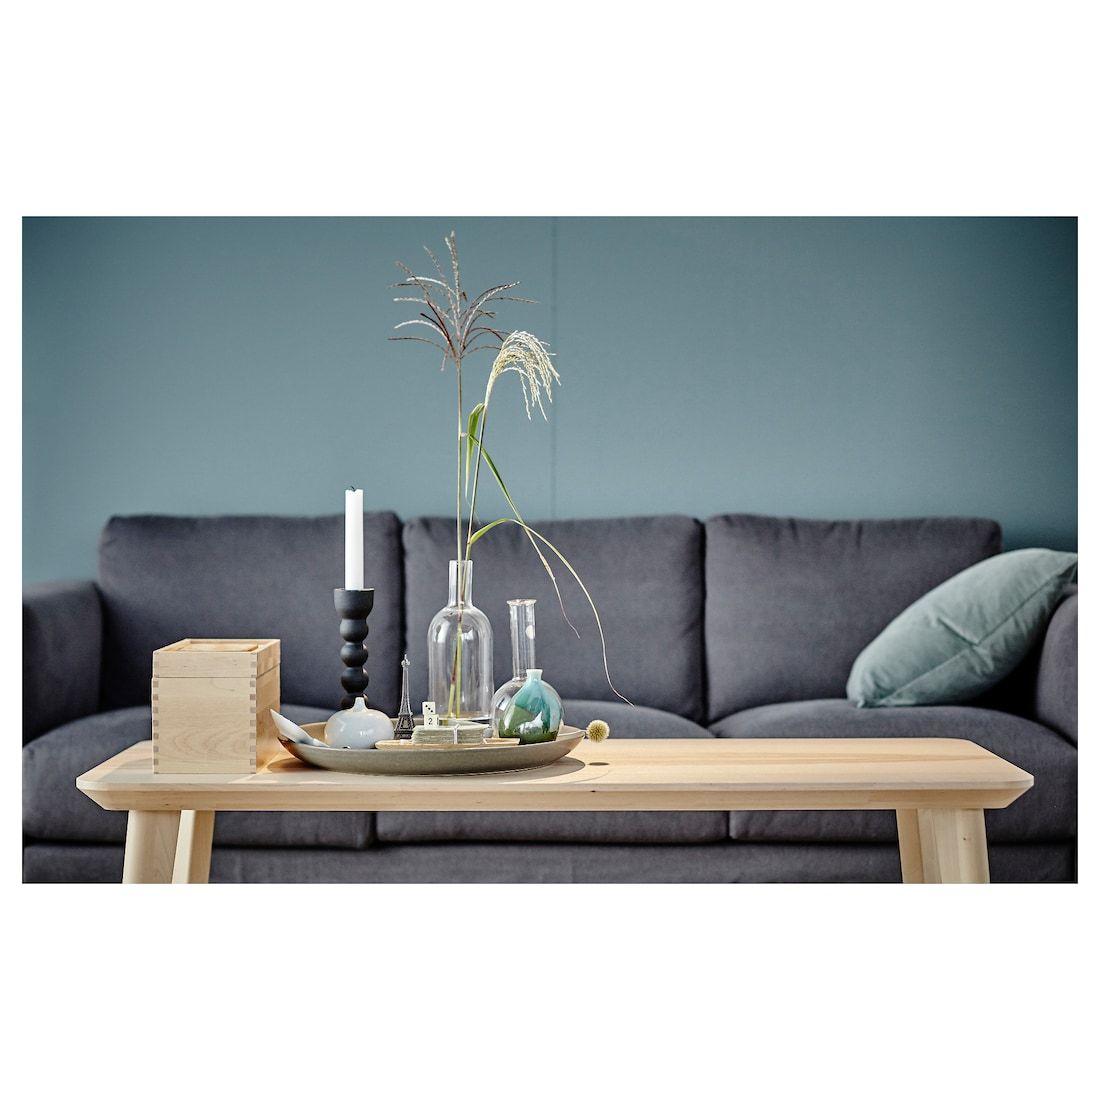 Lisabo Coffee Table Ash Veneer 46 1 2x19 5 8 Ikea In 2021 Coffee Table Farm House Living Room Ikea [ 1100 x 1100 Pixel ]